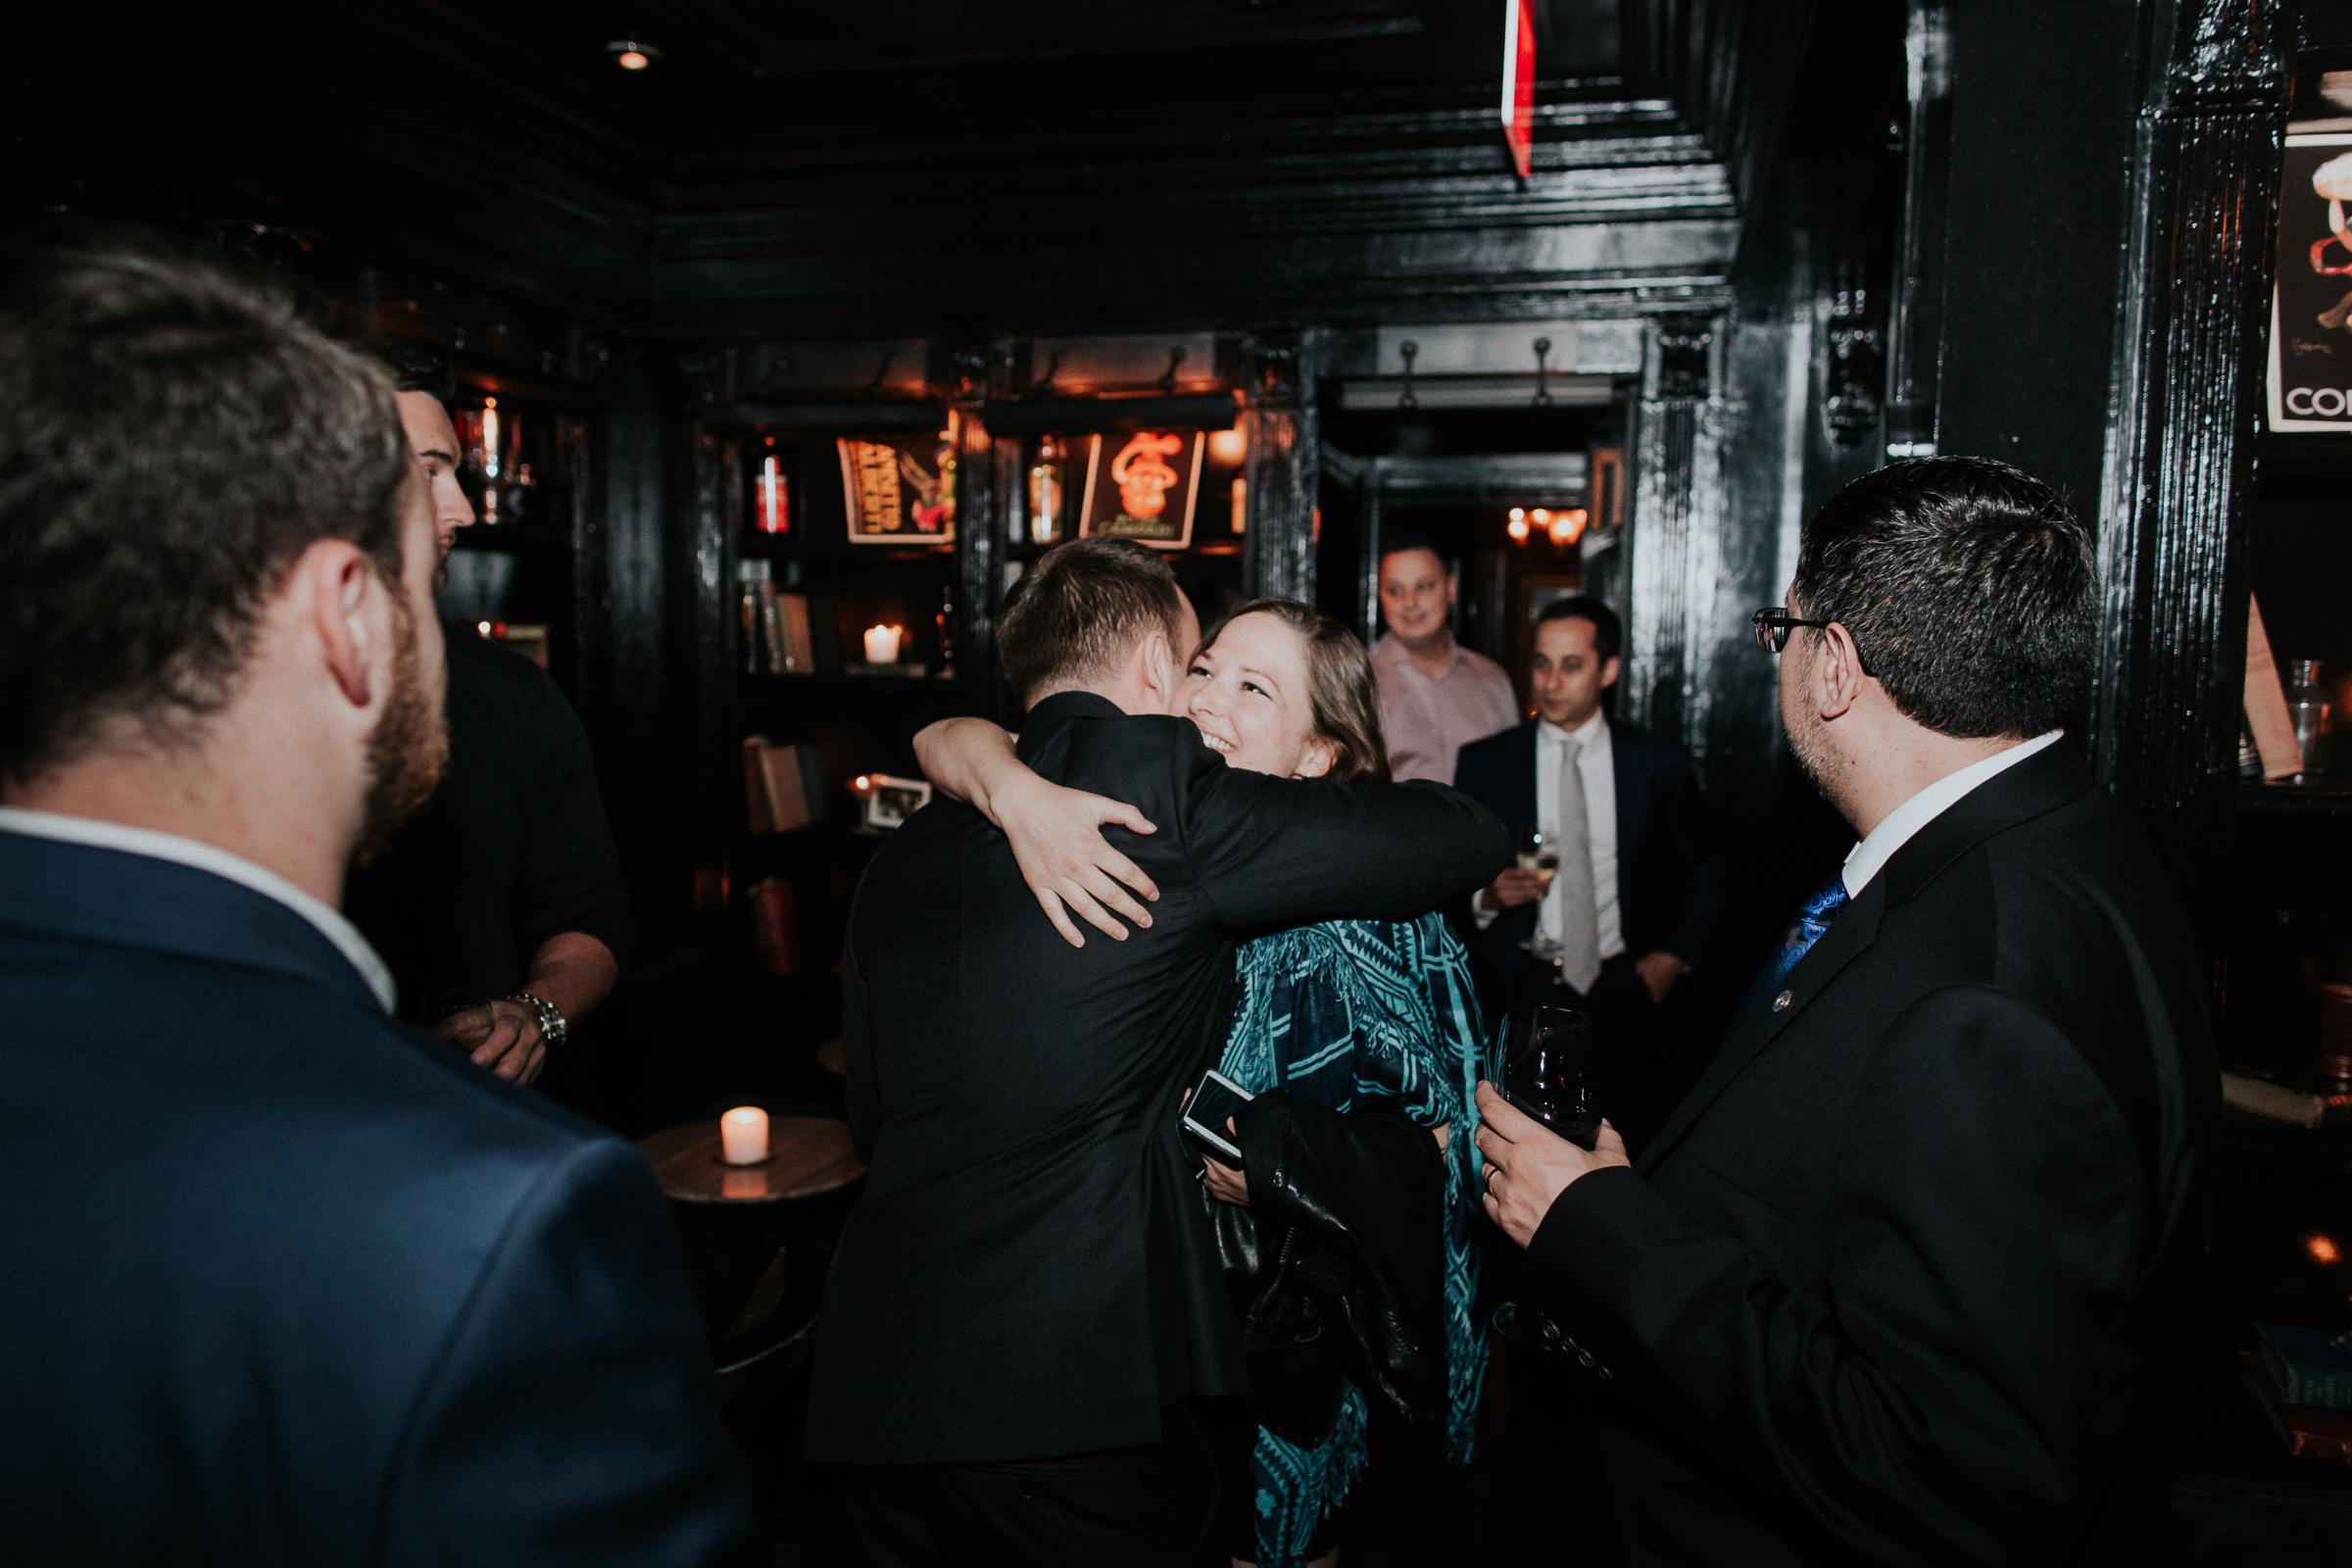 Casa-Apicii-Intimate-Wedding-City-Hall-Elopement-New-York-Documentary-Wedding-Photographer-53.jpg